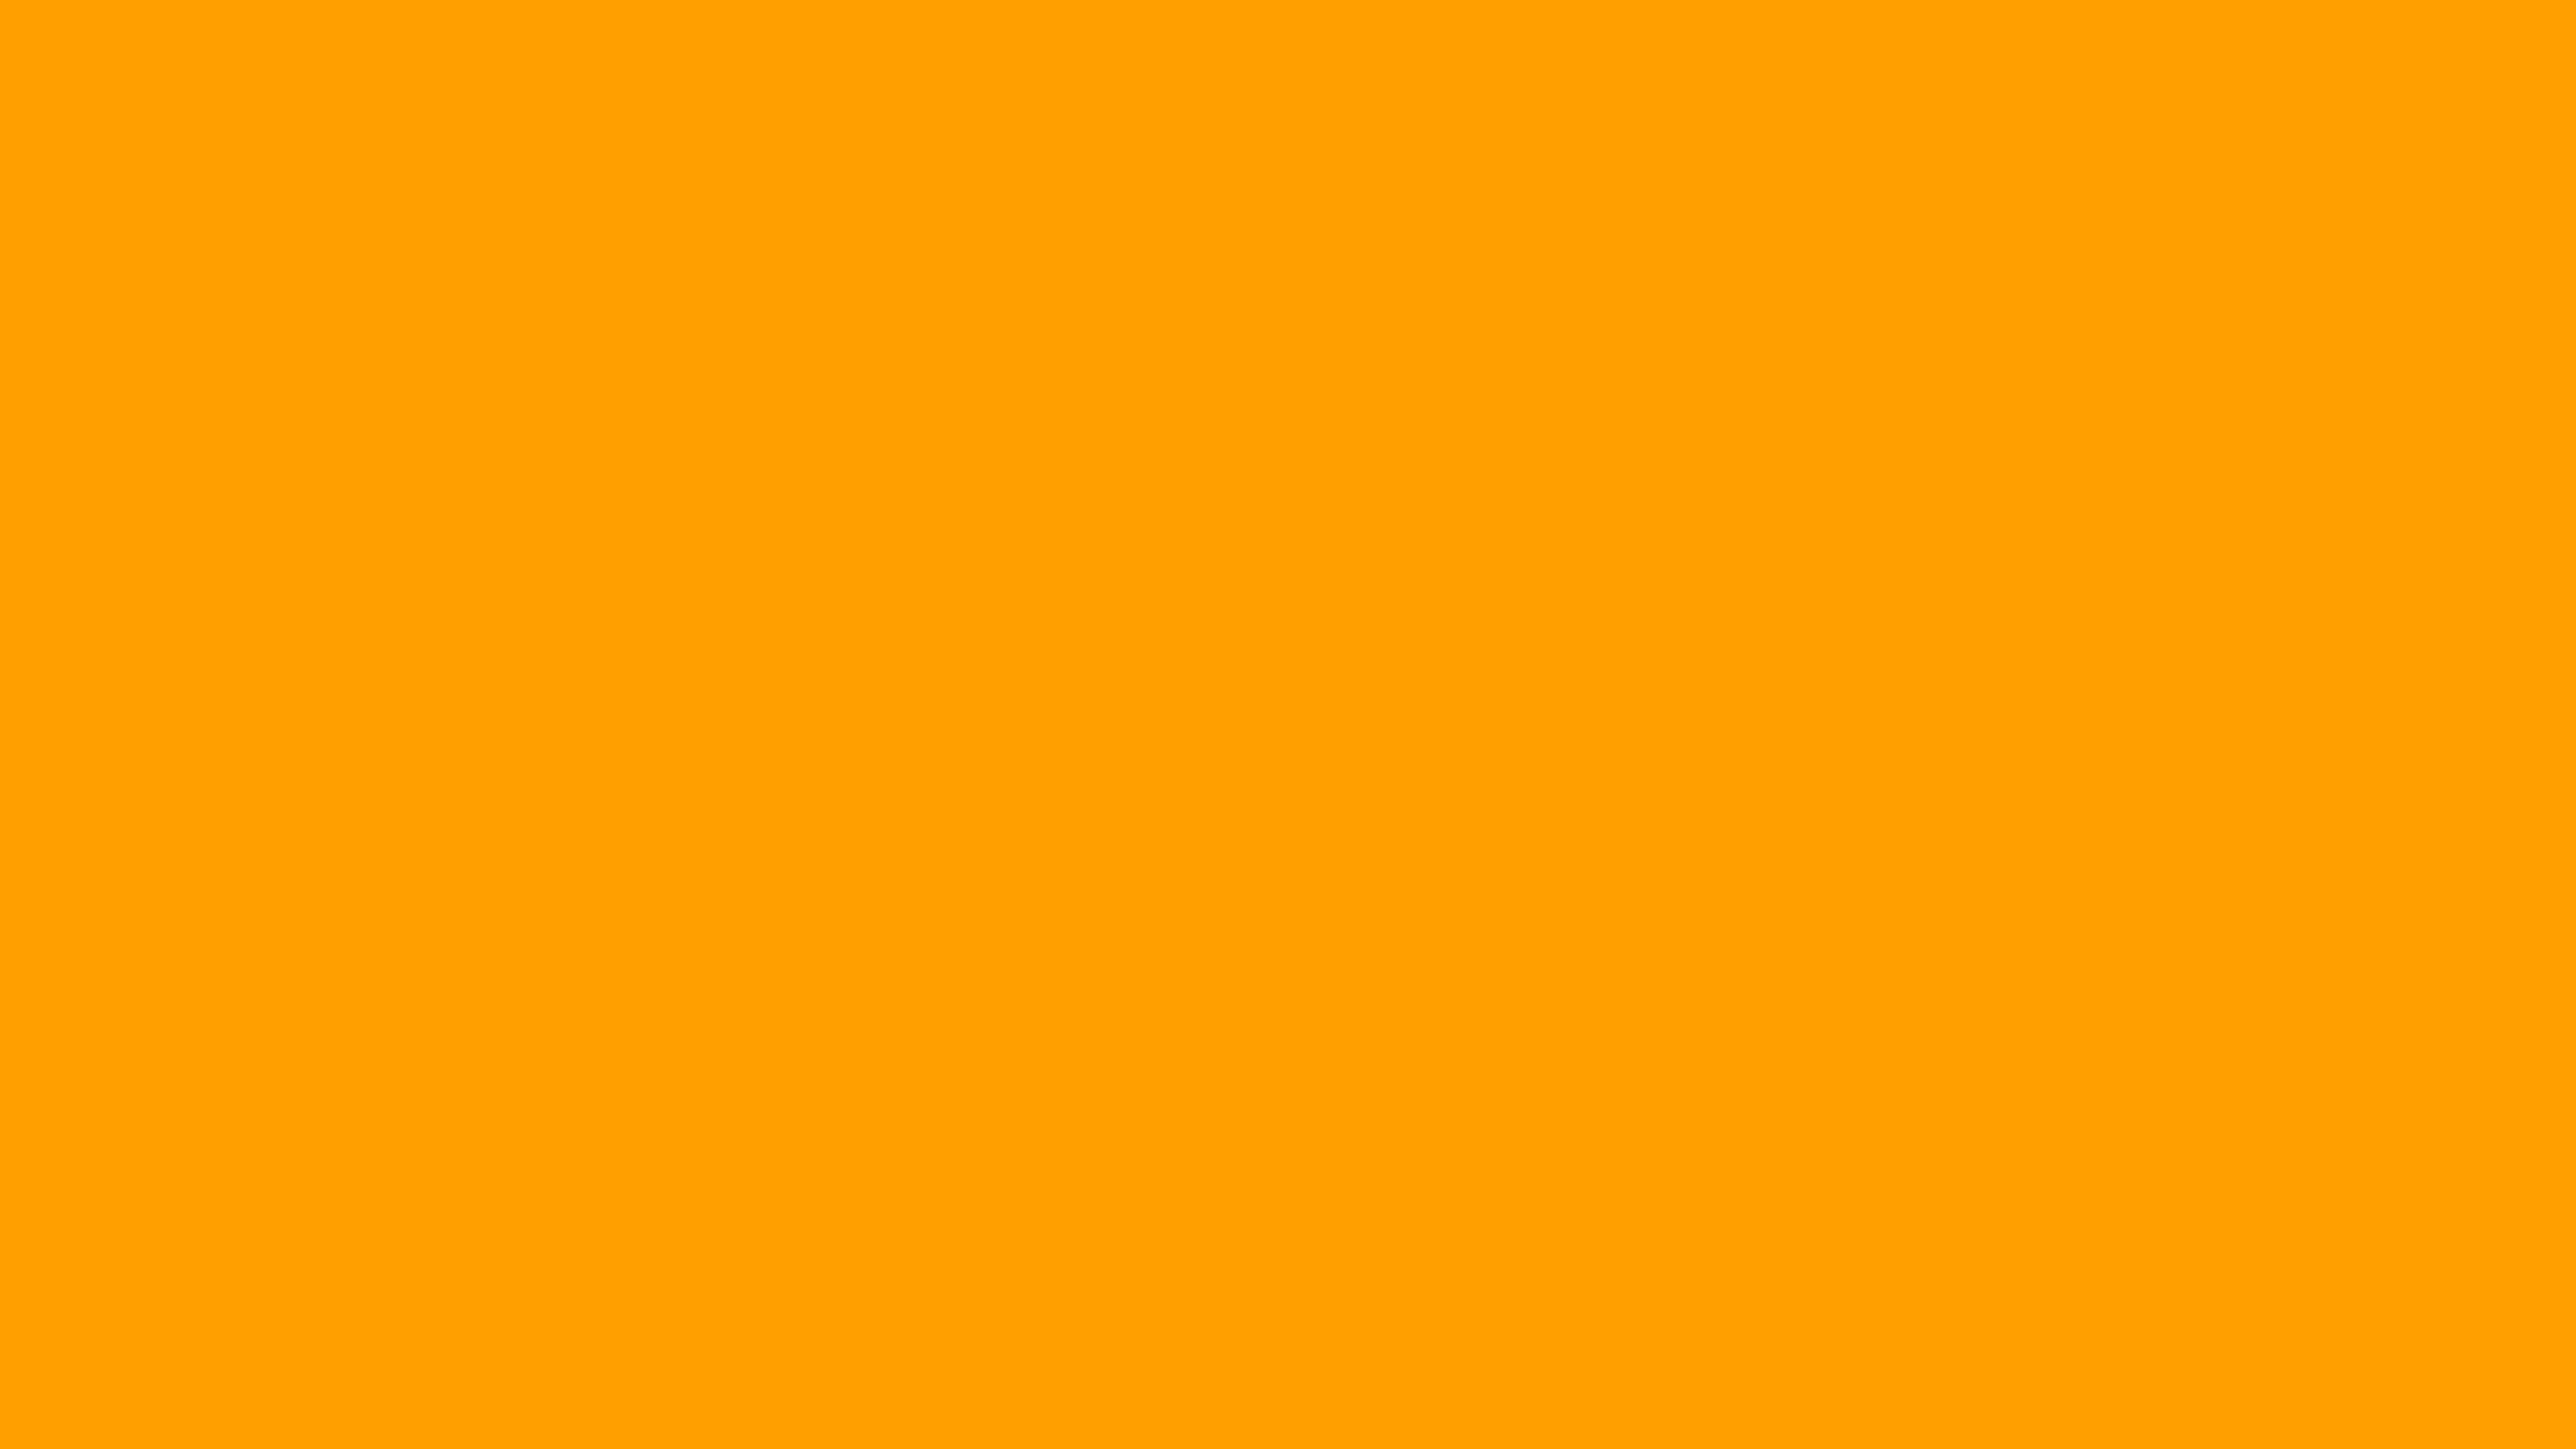 4096x2304 Orange Peel Solid Color Background